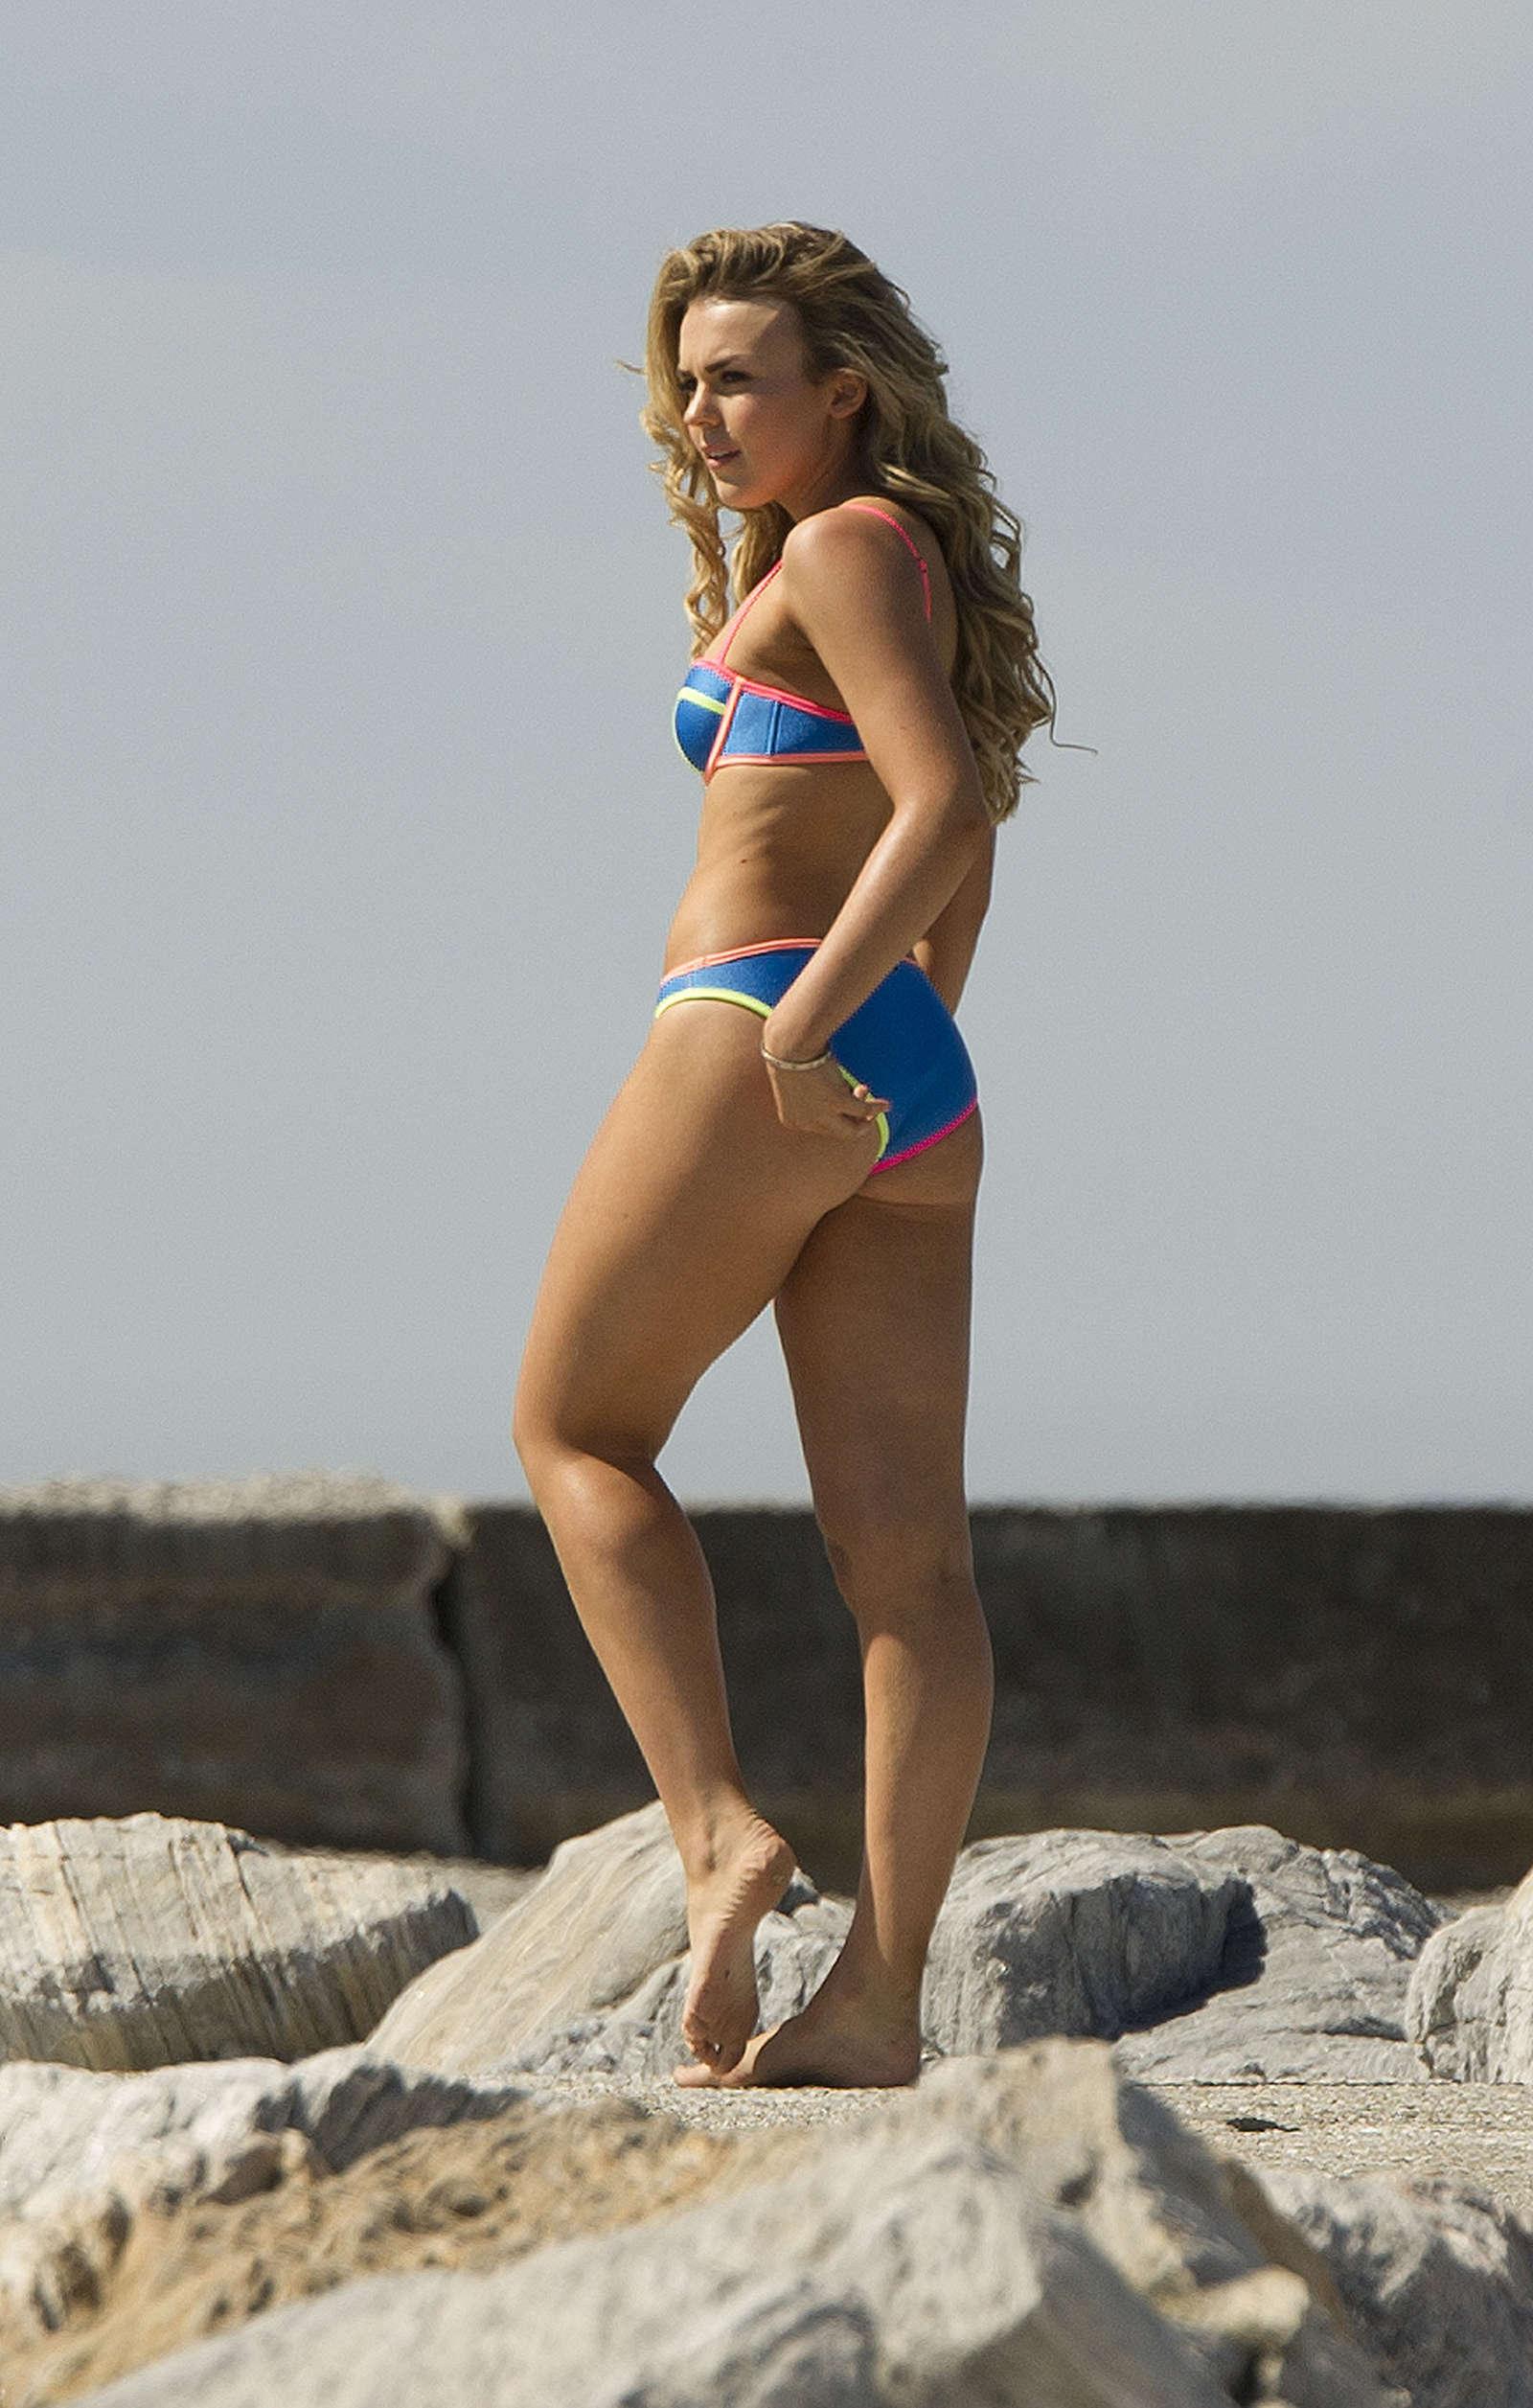 Jordana brewster bikini 6 new picture